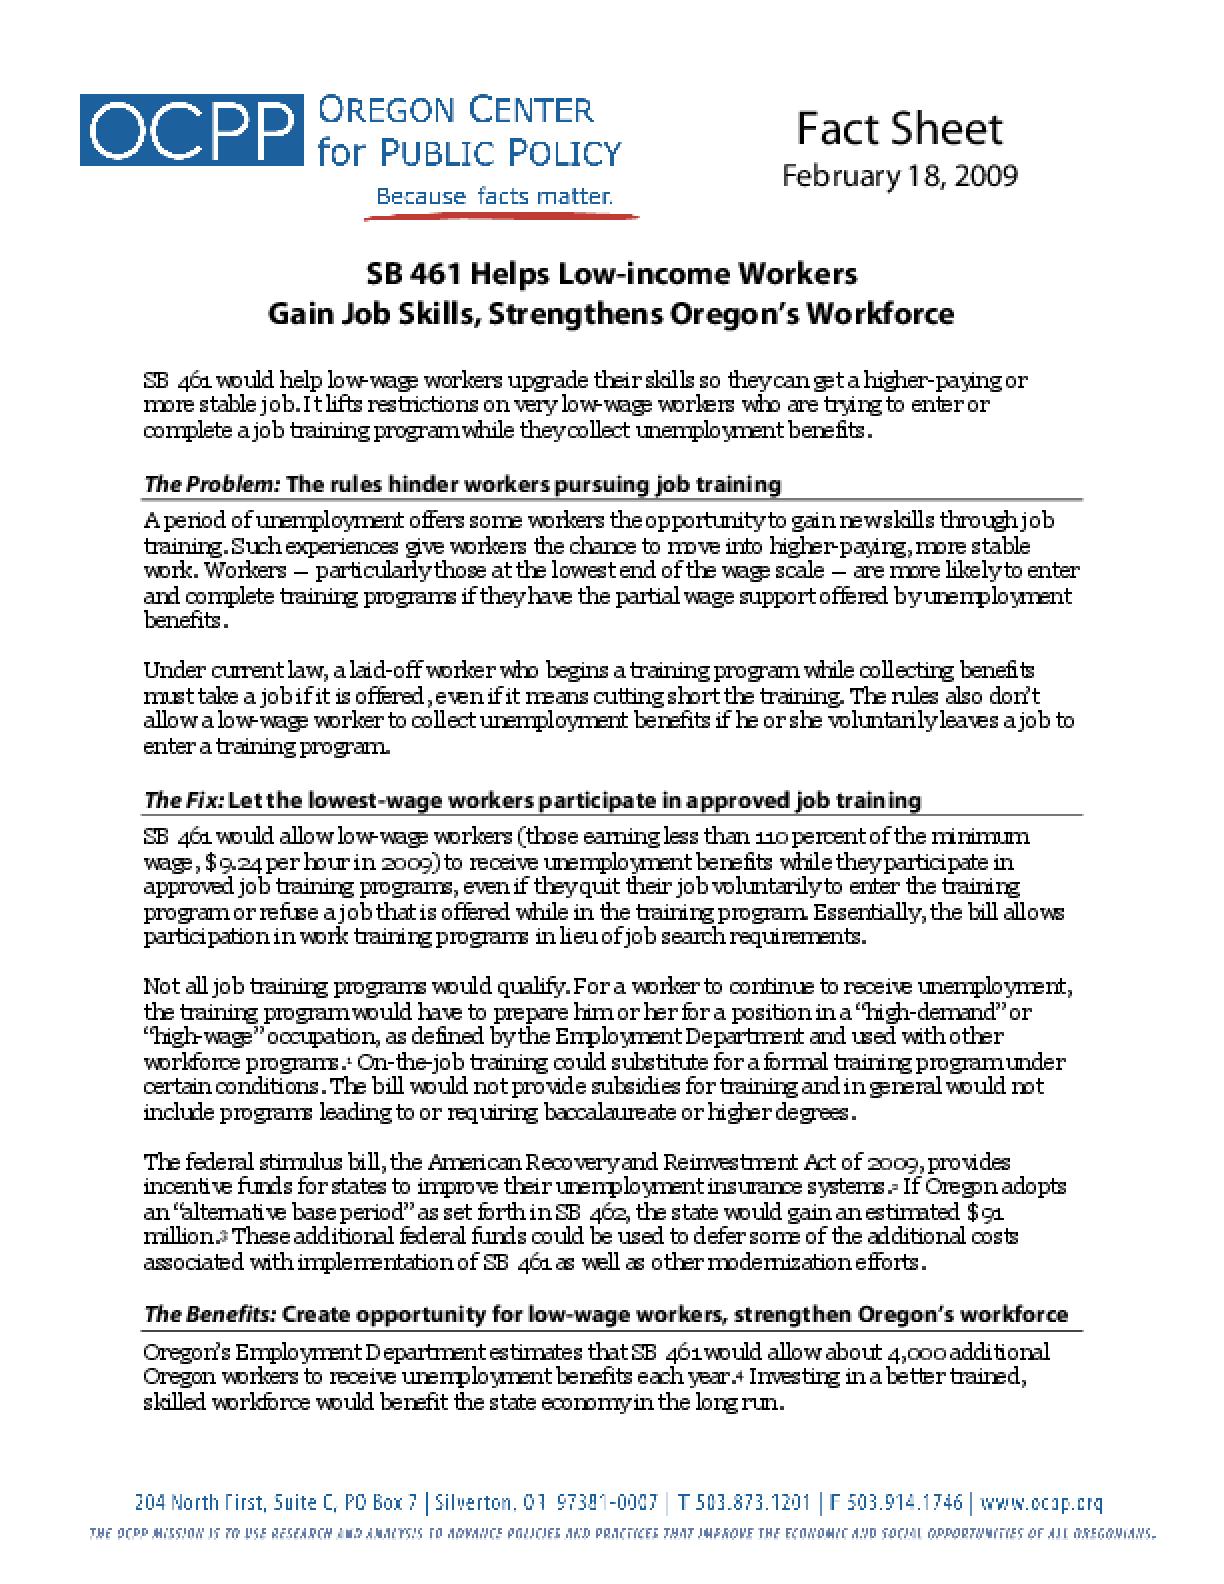 SB 461 Helps Low-income Workers Gain Job Skills, Strengthens Oregon's Workforce